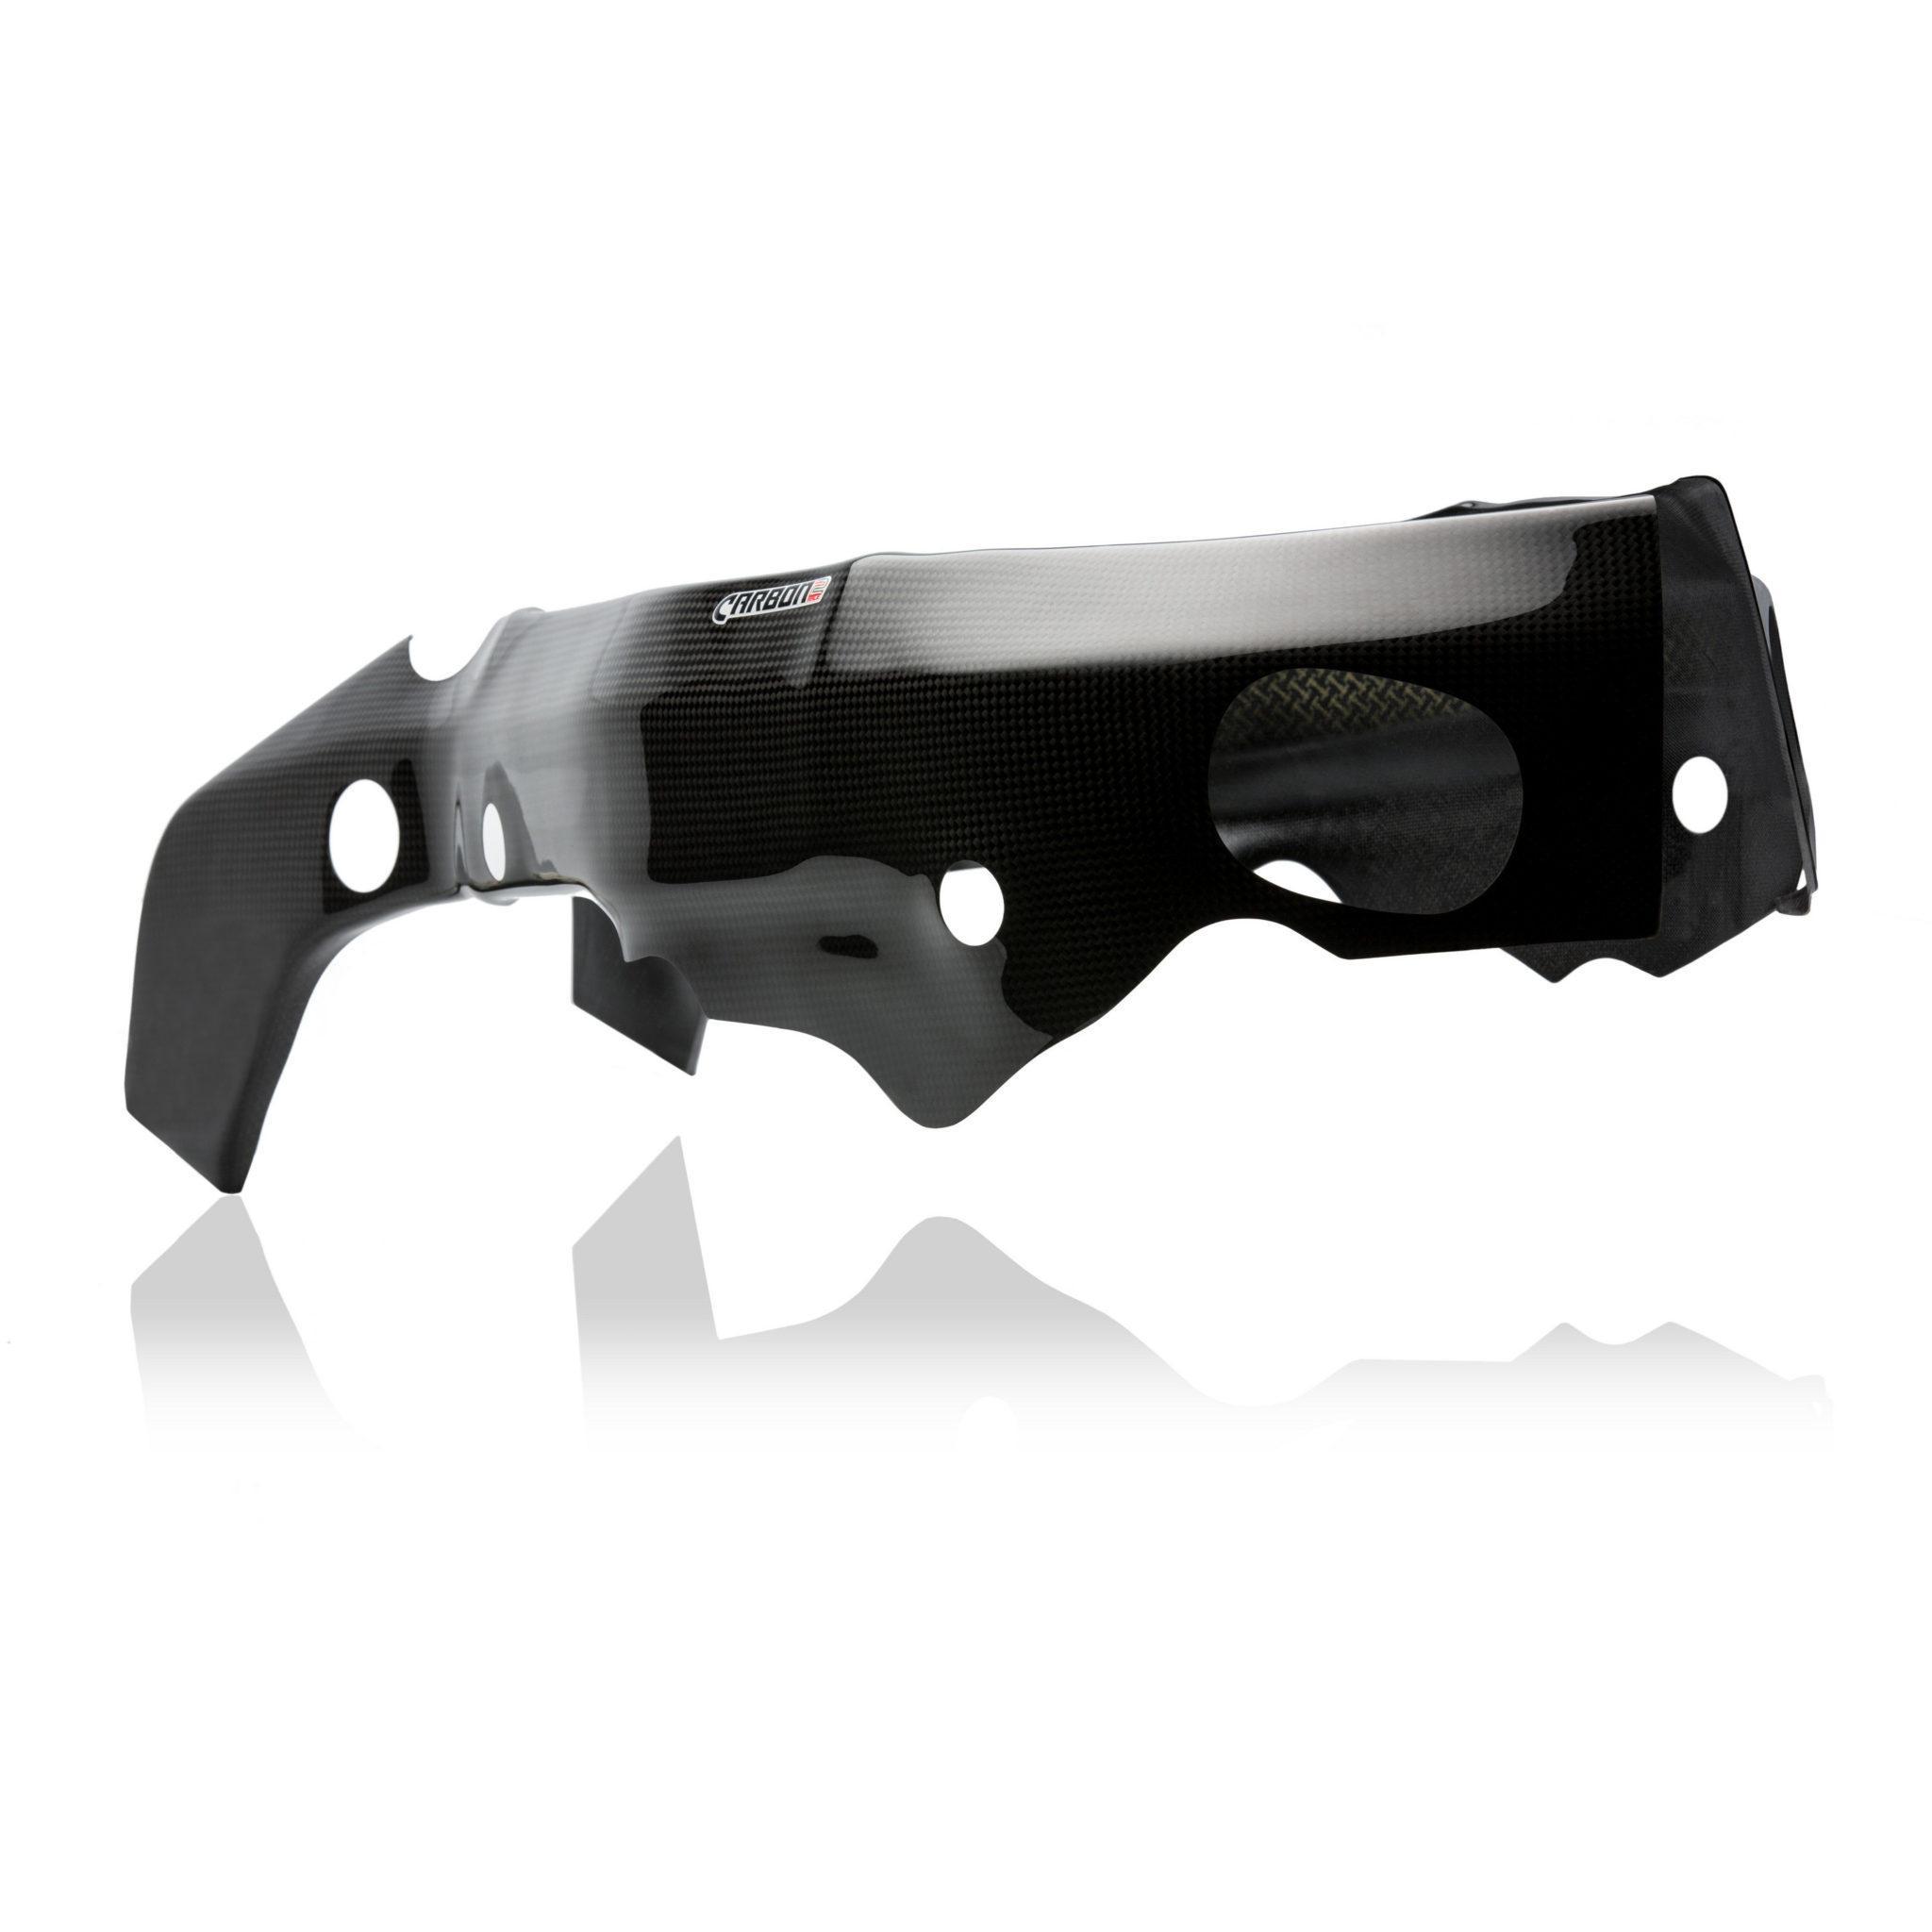 SUZUKI GSX-R 1000 2005-2006 Carbon Fiber Frame Covers